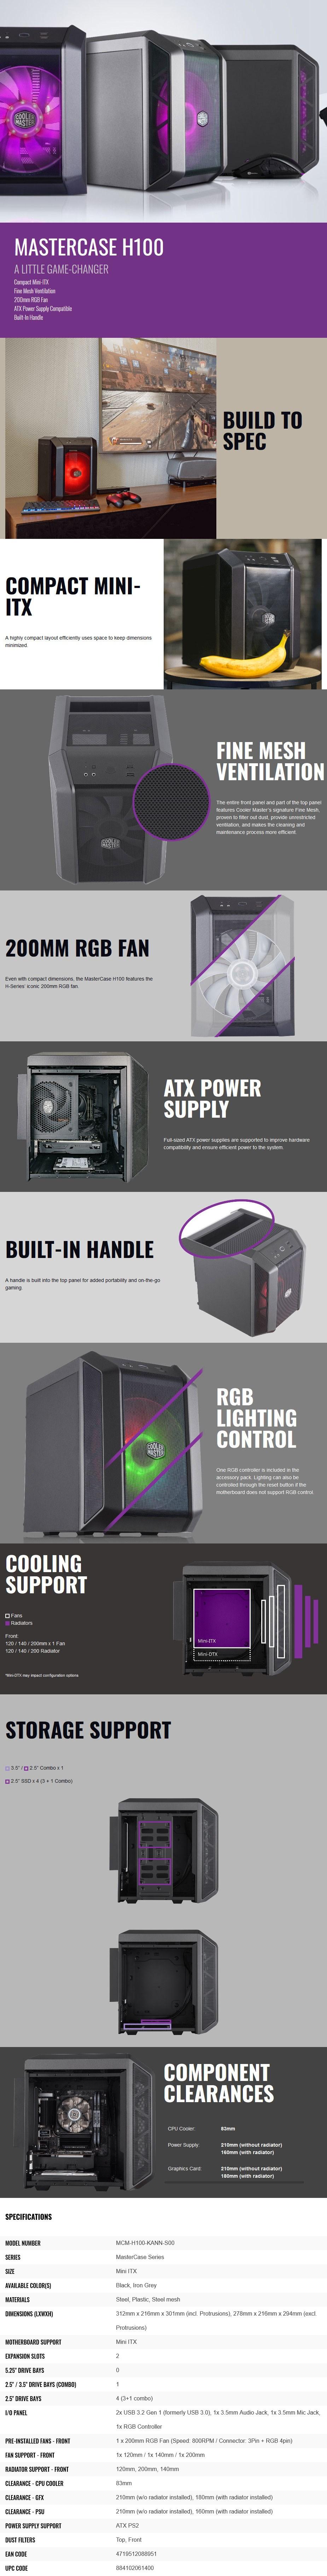 cooler-master-mastercase-h100-rgb-miniitx-case-ac28951-11.jpg